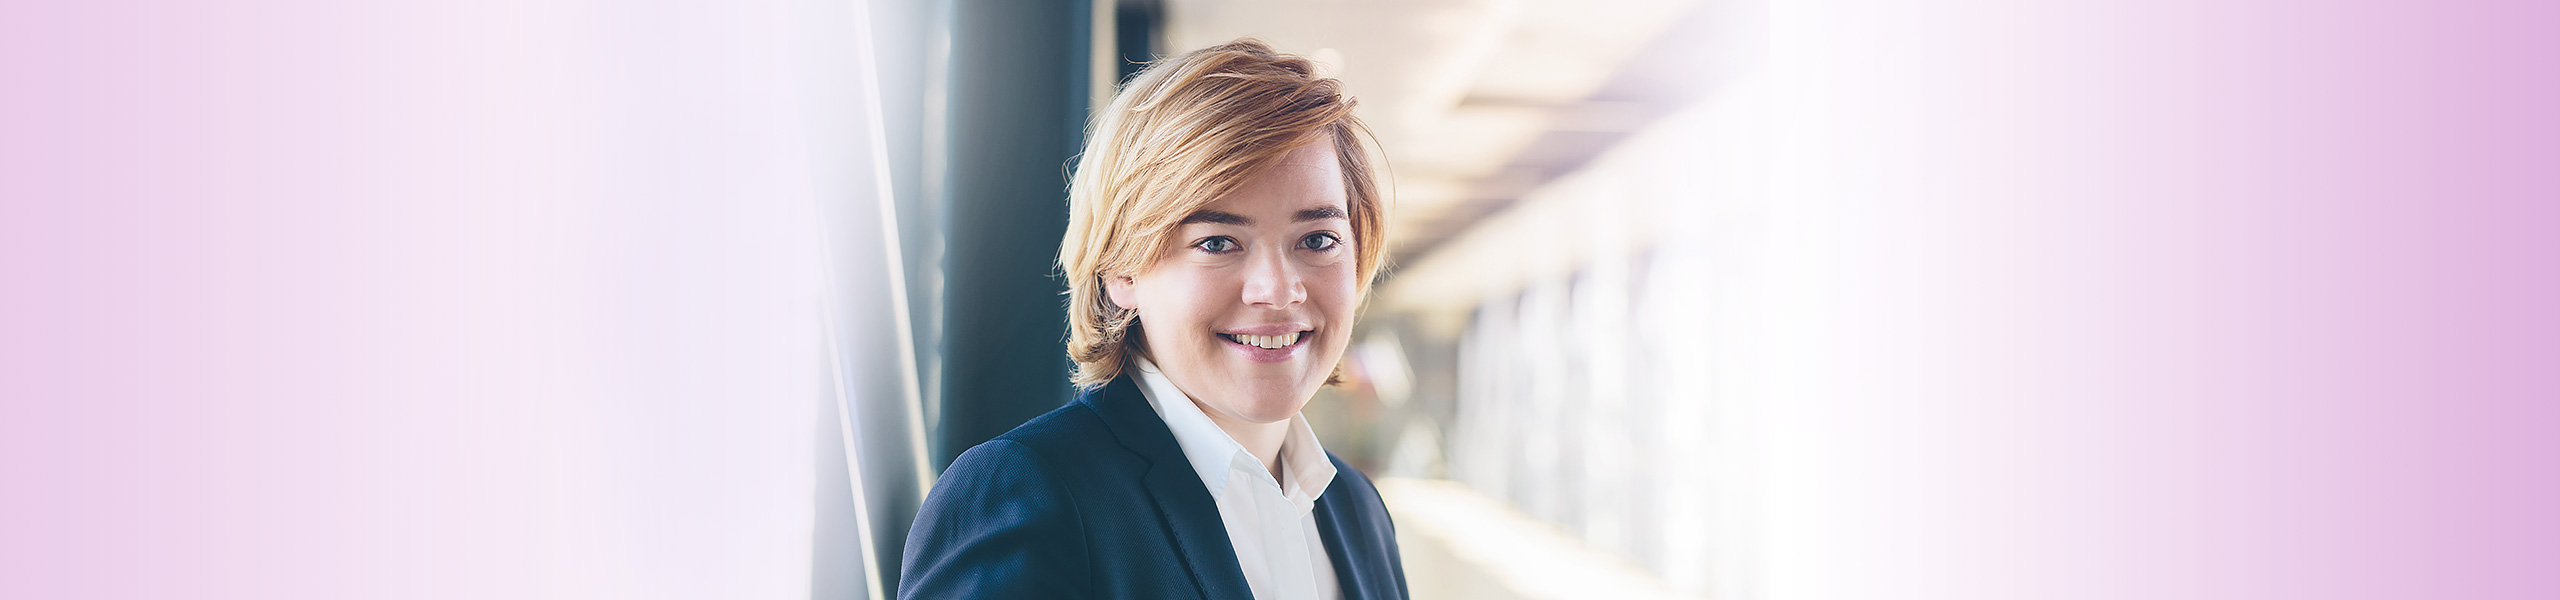 Valerie Meise Senior Projektleiterin